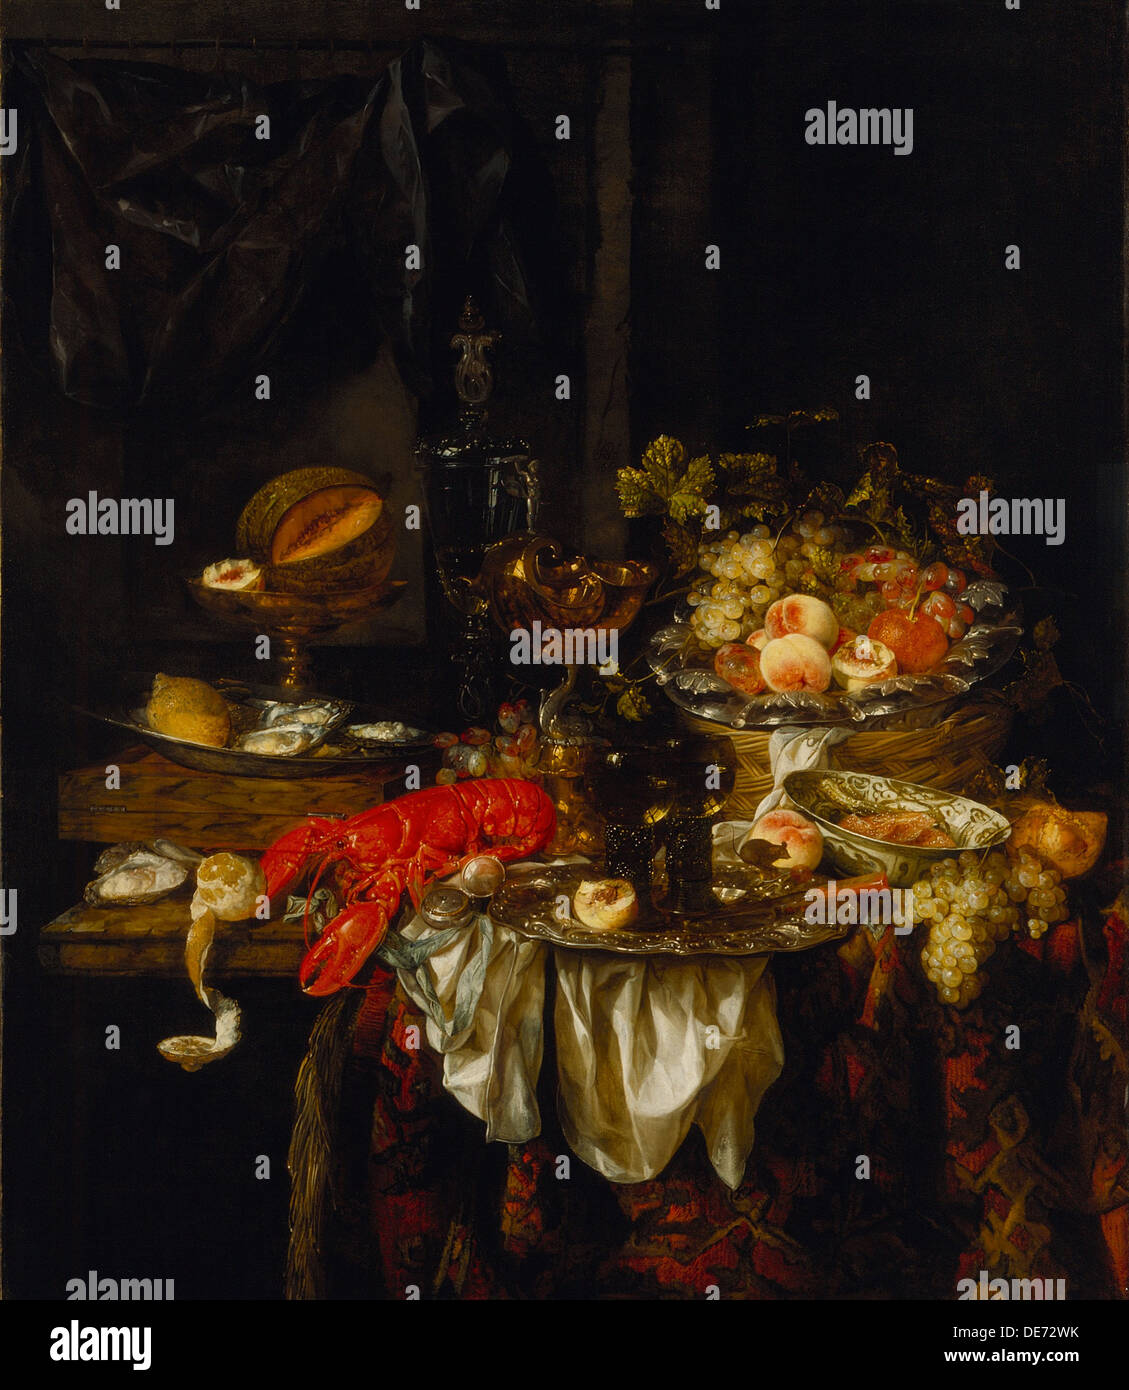 Banquet Still Life, 1667. Artist: Beijeren, Abraham Hendricksz, van (1620/21-1690) - Stock Image